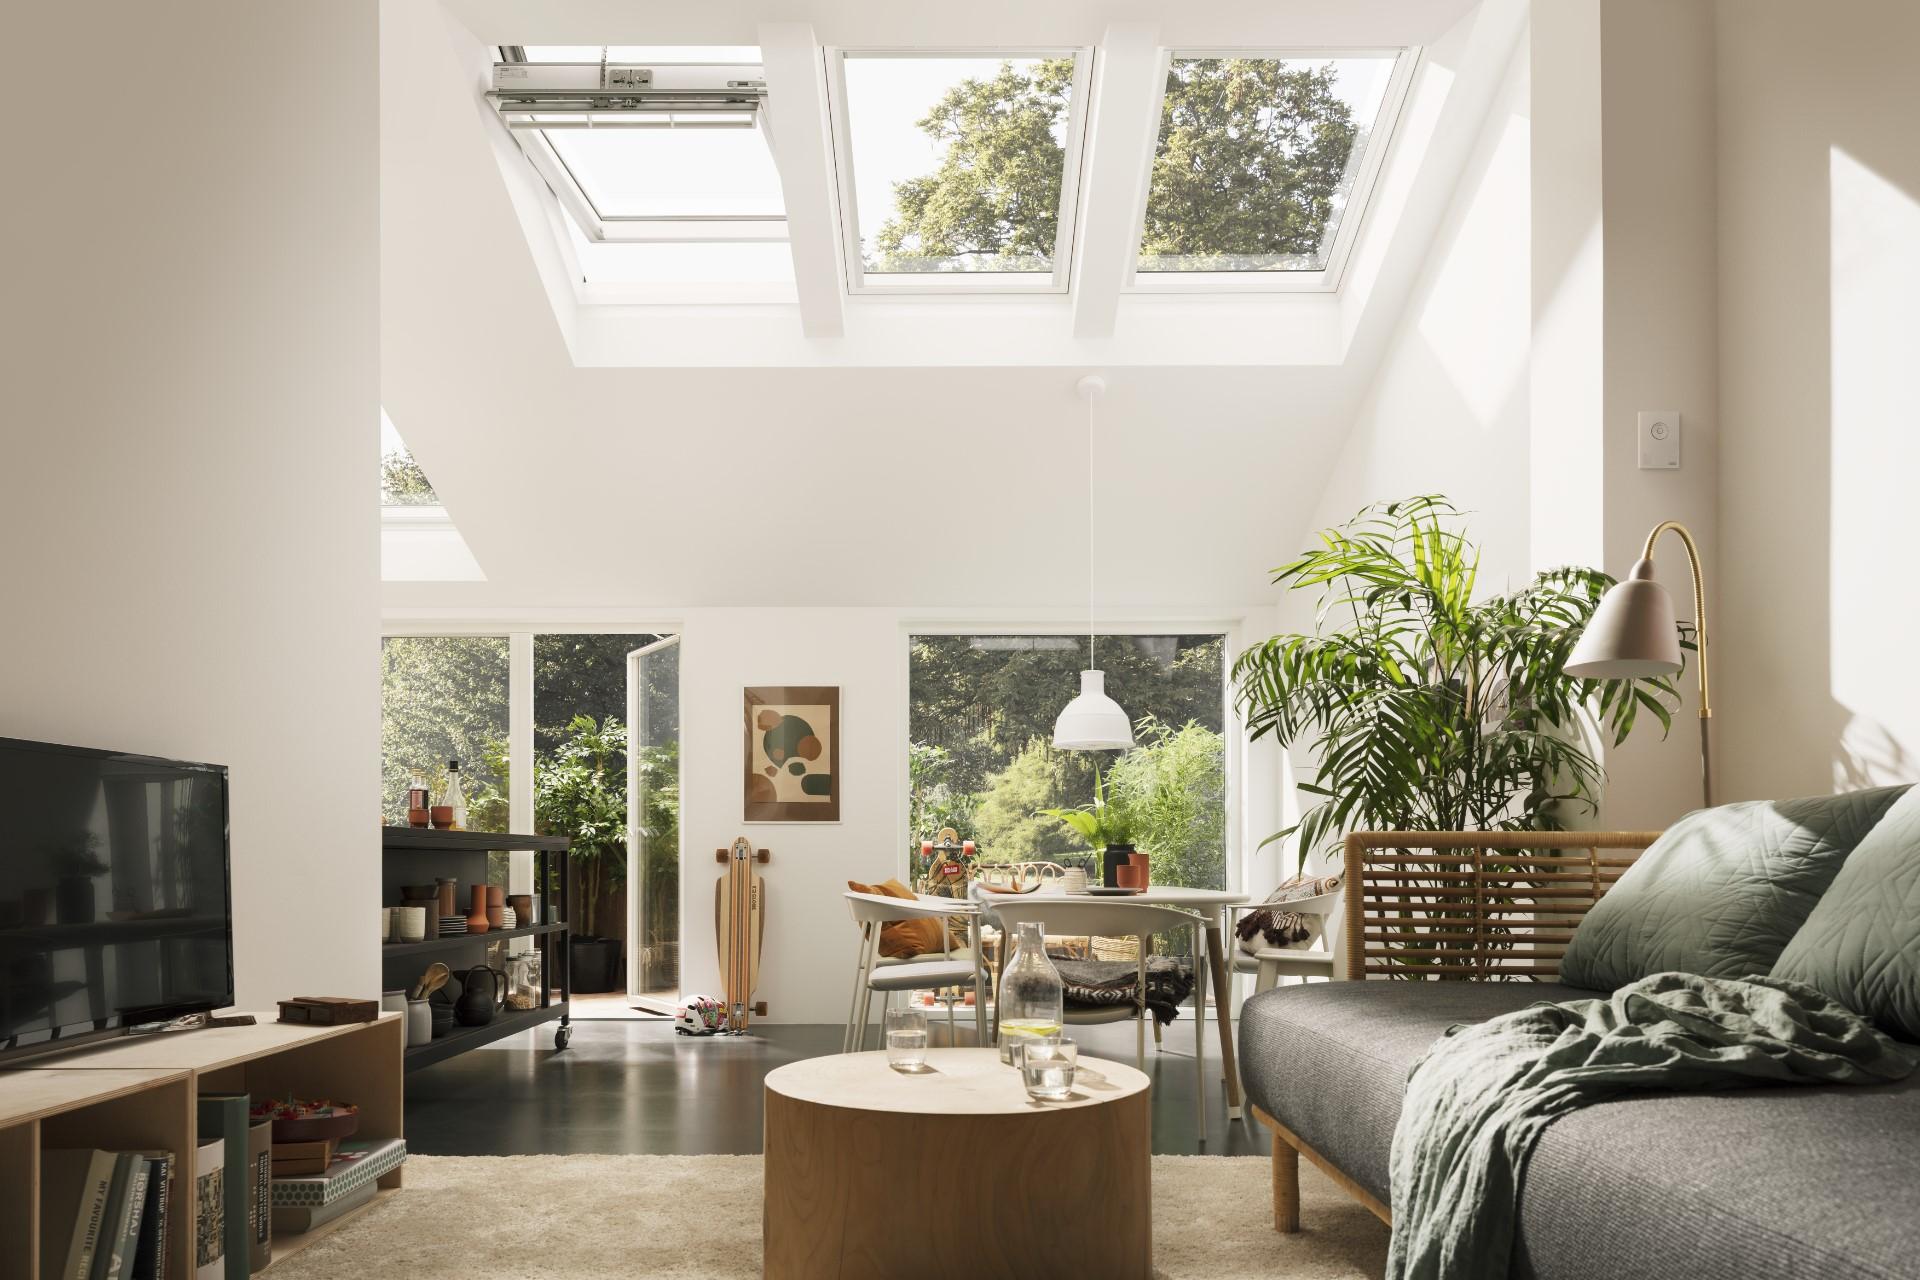 Tutti i costi per ristrutturare una mansarda - Costi per ristrutturare casa ...